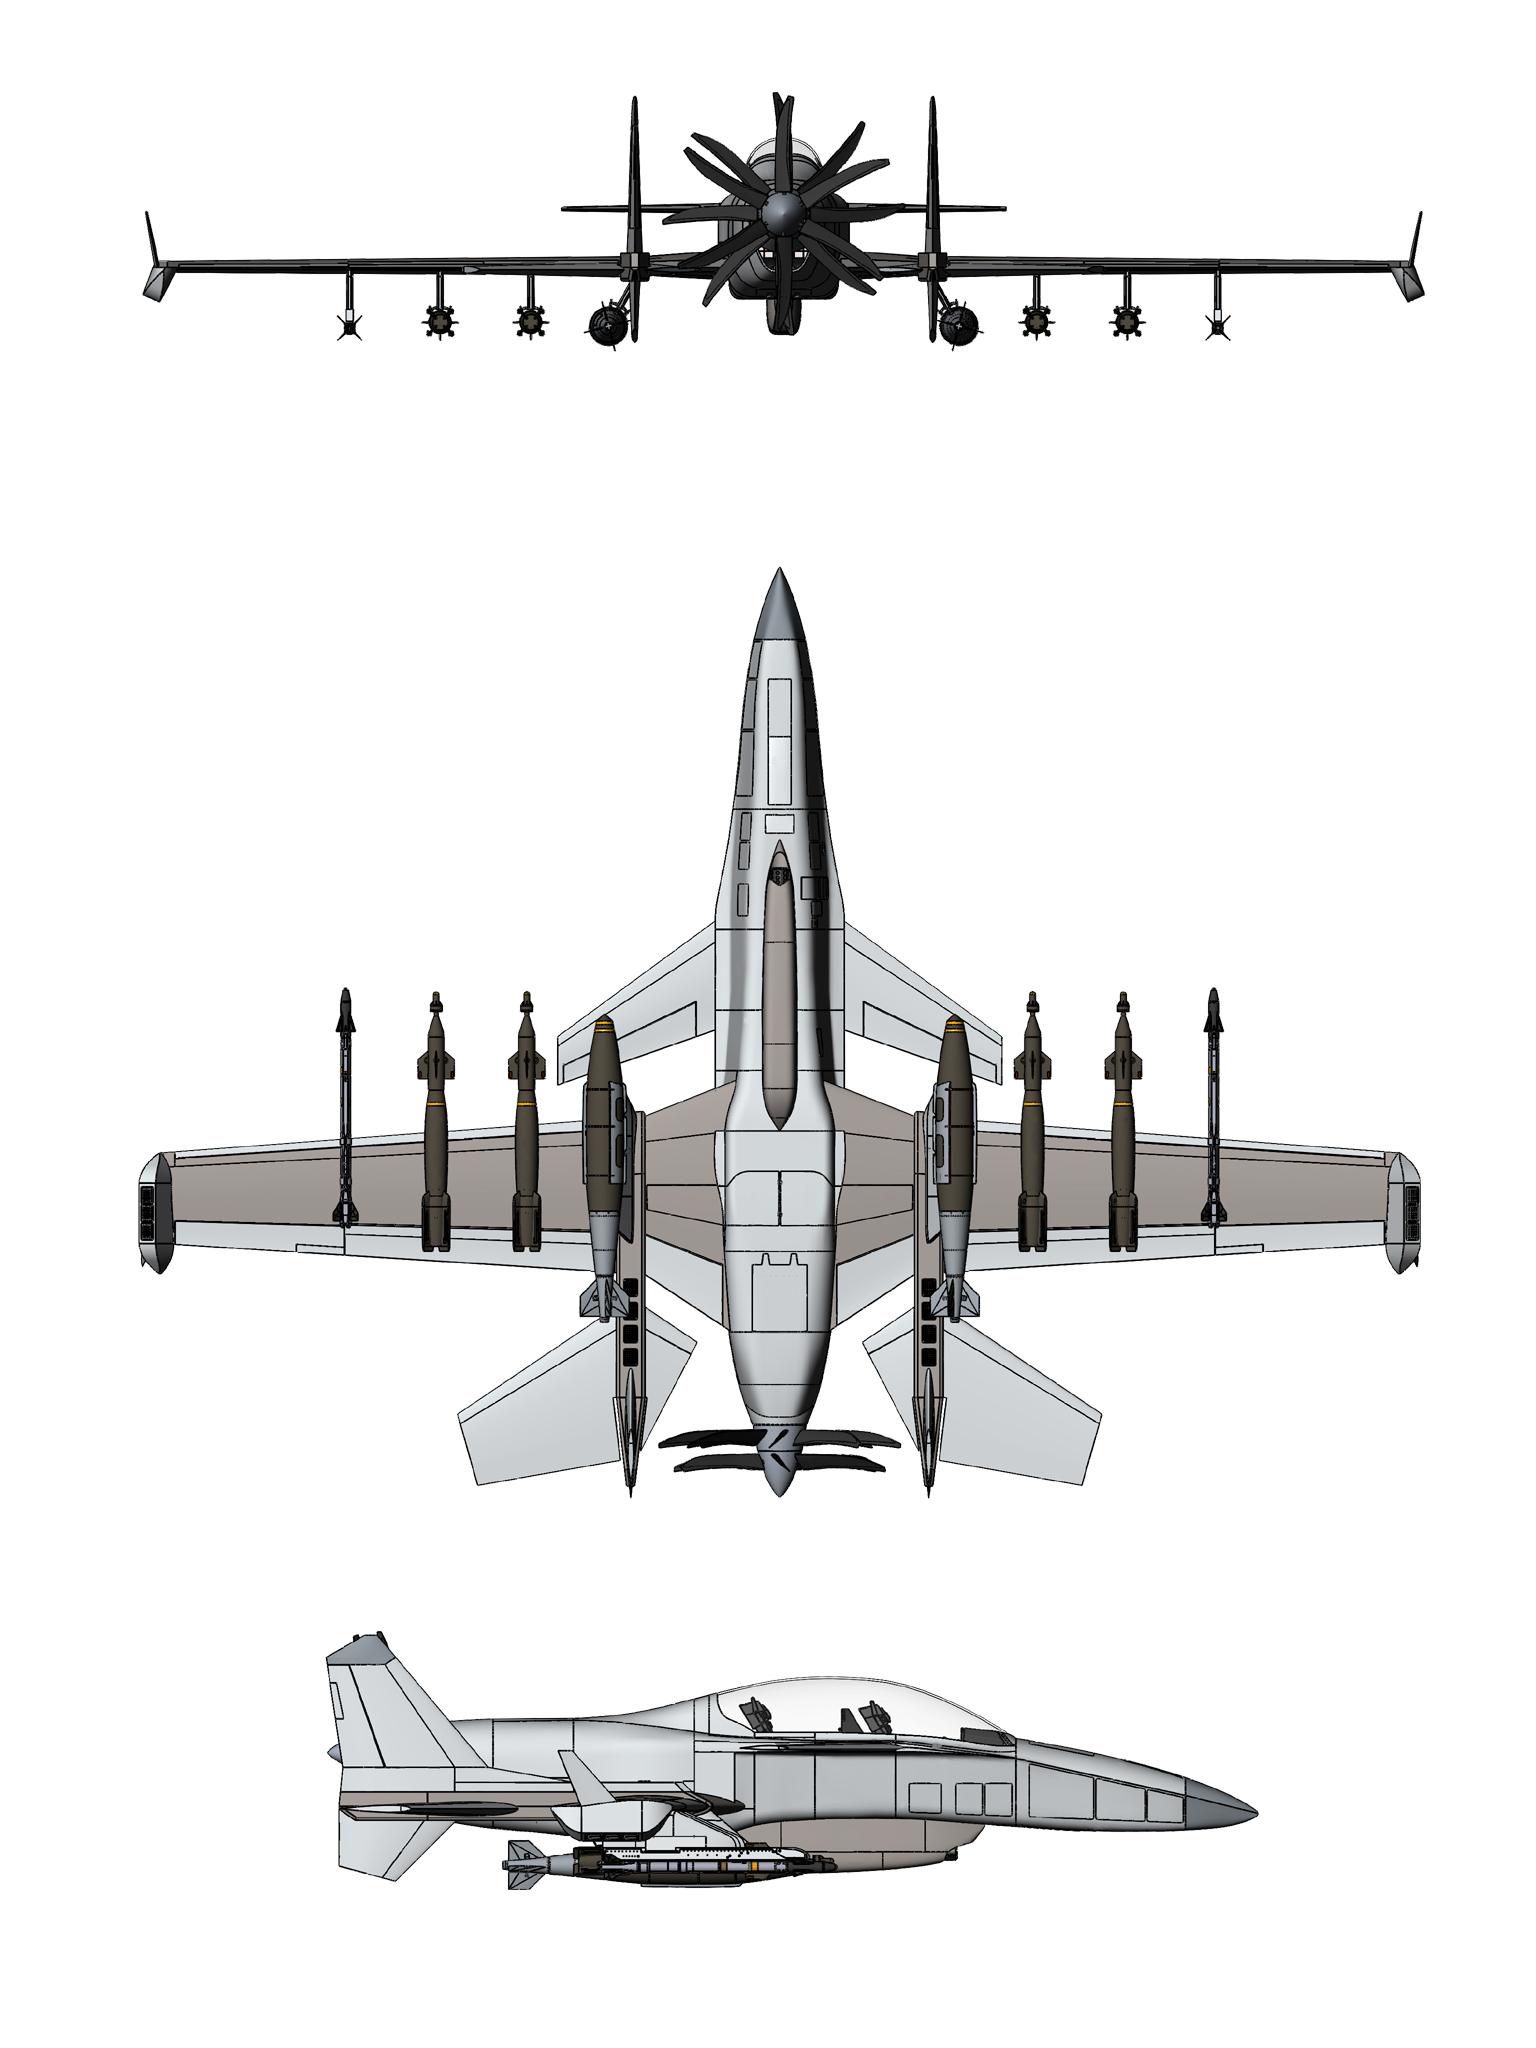 SM27T-MACHETE-ARMED-VENTRAL